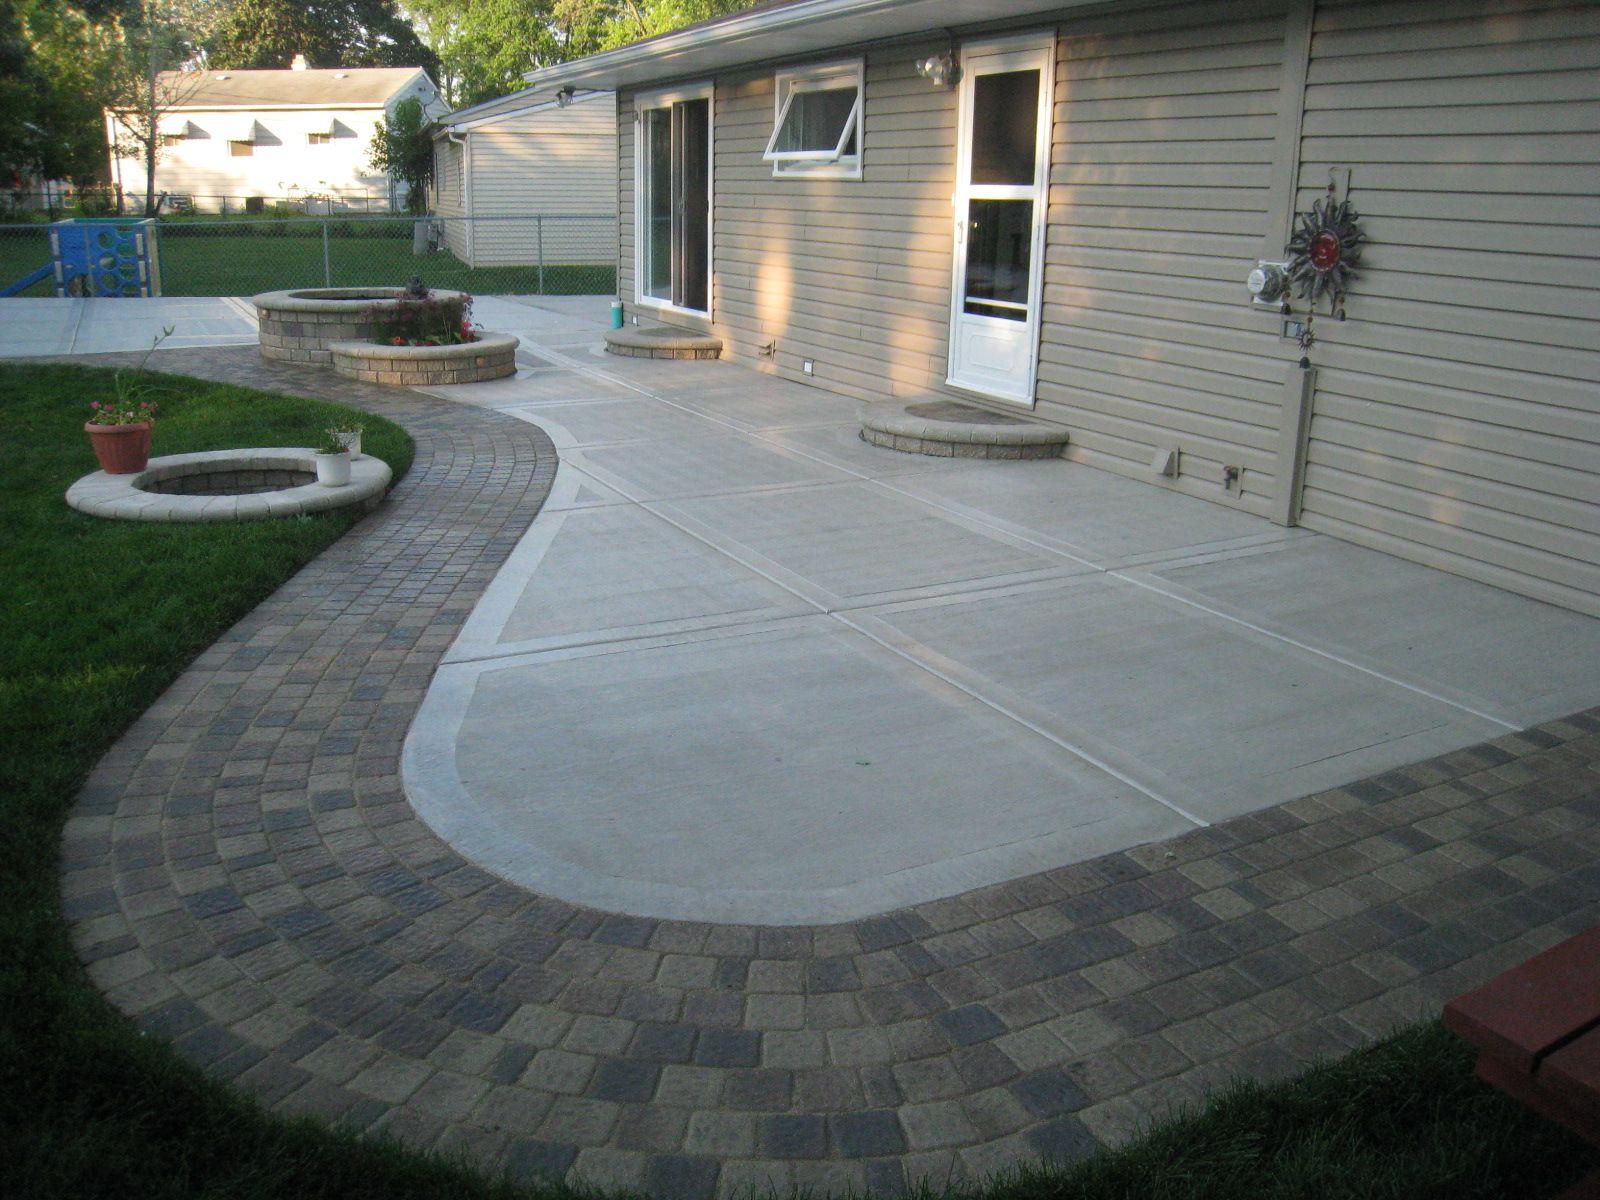 concrete patio needs decorative resurfacing